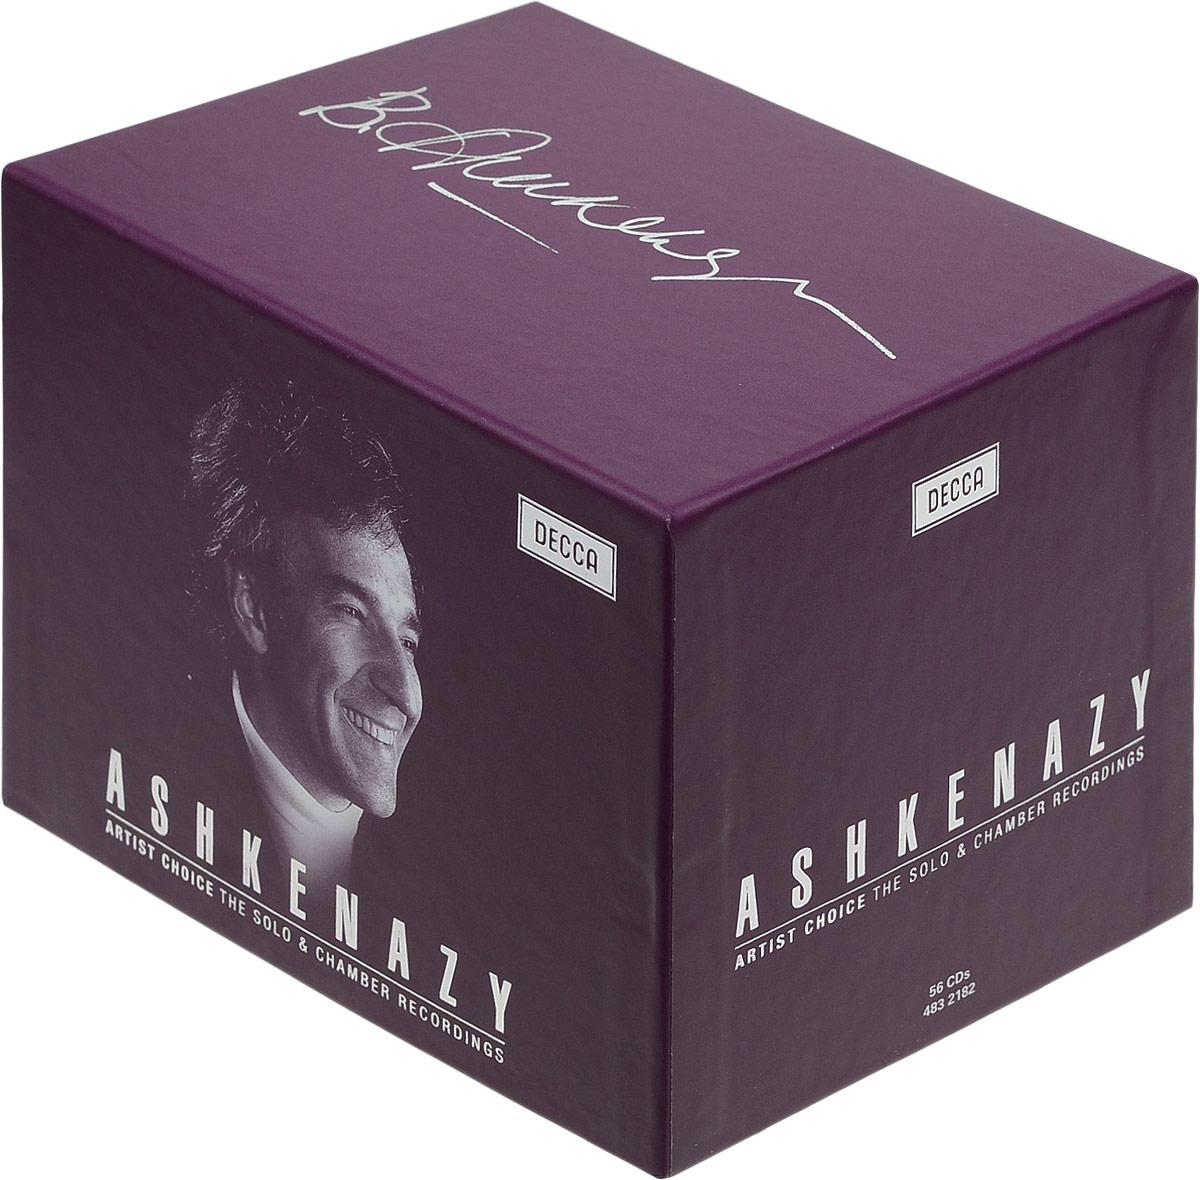 Владимир Ашкенази Vladimir Ashkenazy. Piano & Chamber (56 CD) vladimir ashkenazy beethoven the piano concertos 3 cd